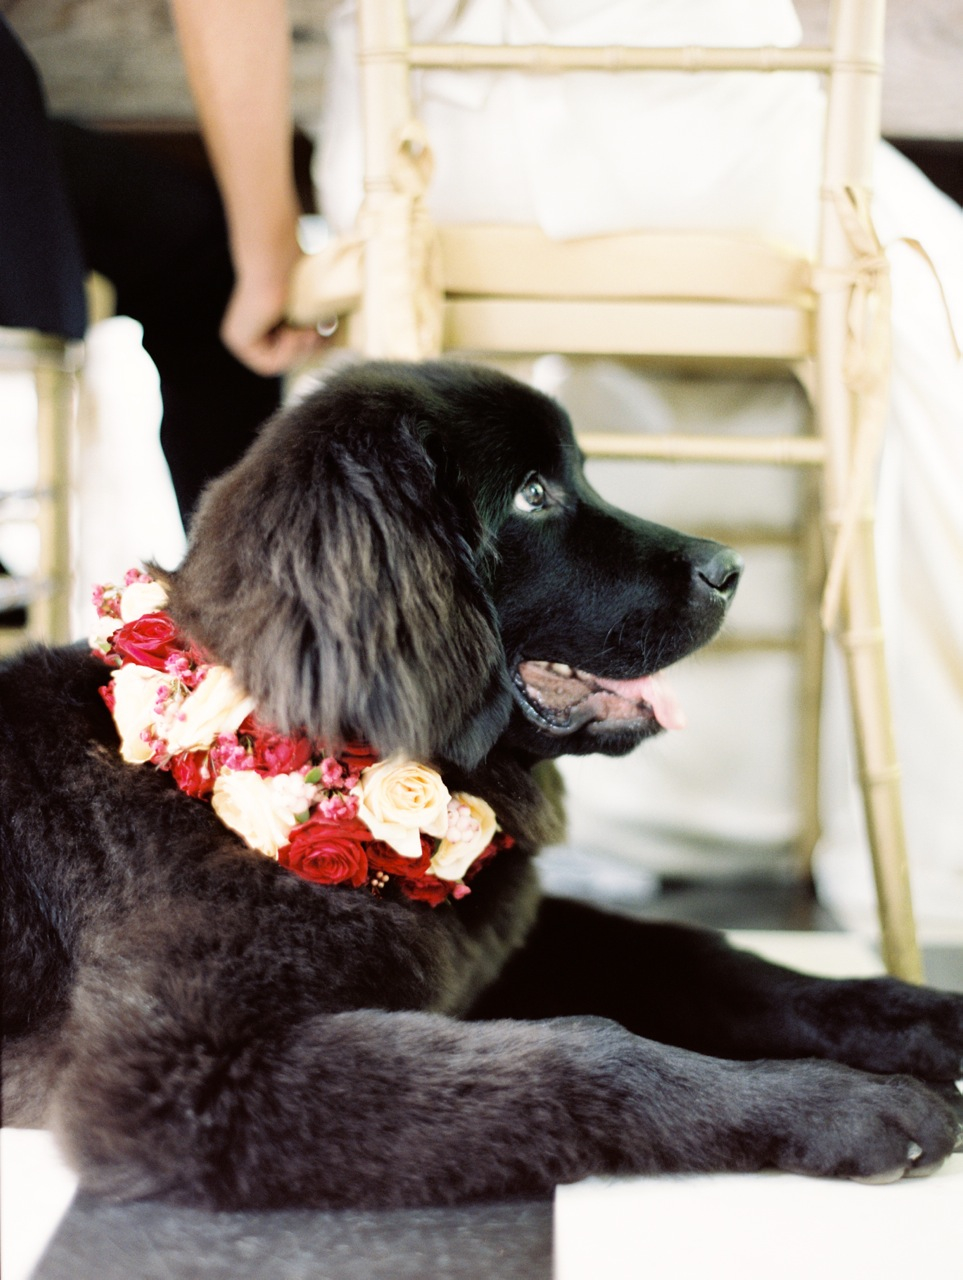 Real Weddings, Wedding Style, West Coast Real Weddings, Garden Real Weddings, Garden Weddings, Pets, Romantic Real Weddings, Romantic Weddings